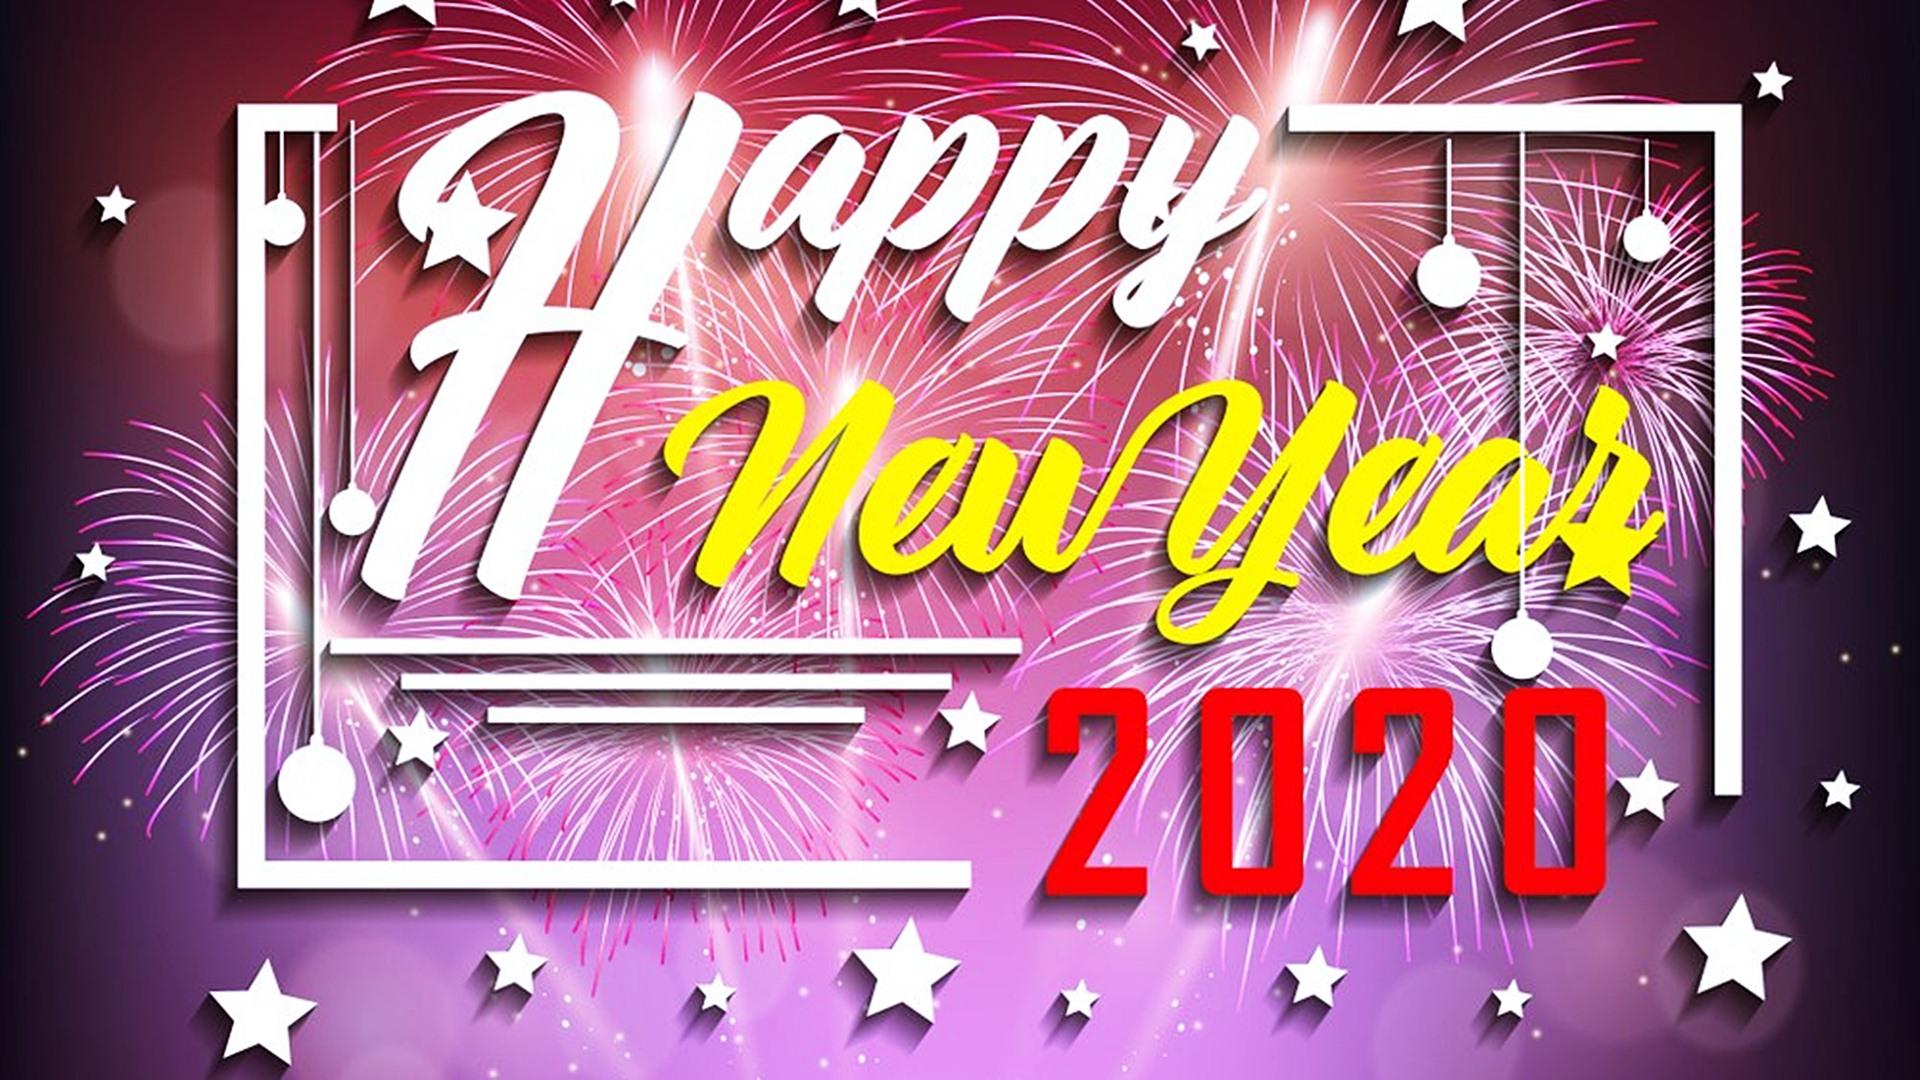 Happy New Year 2020 HD Wallpaper 45550   Baltana 1920x1080